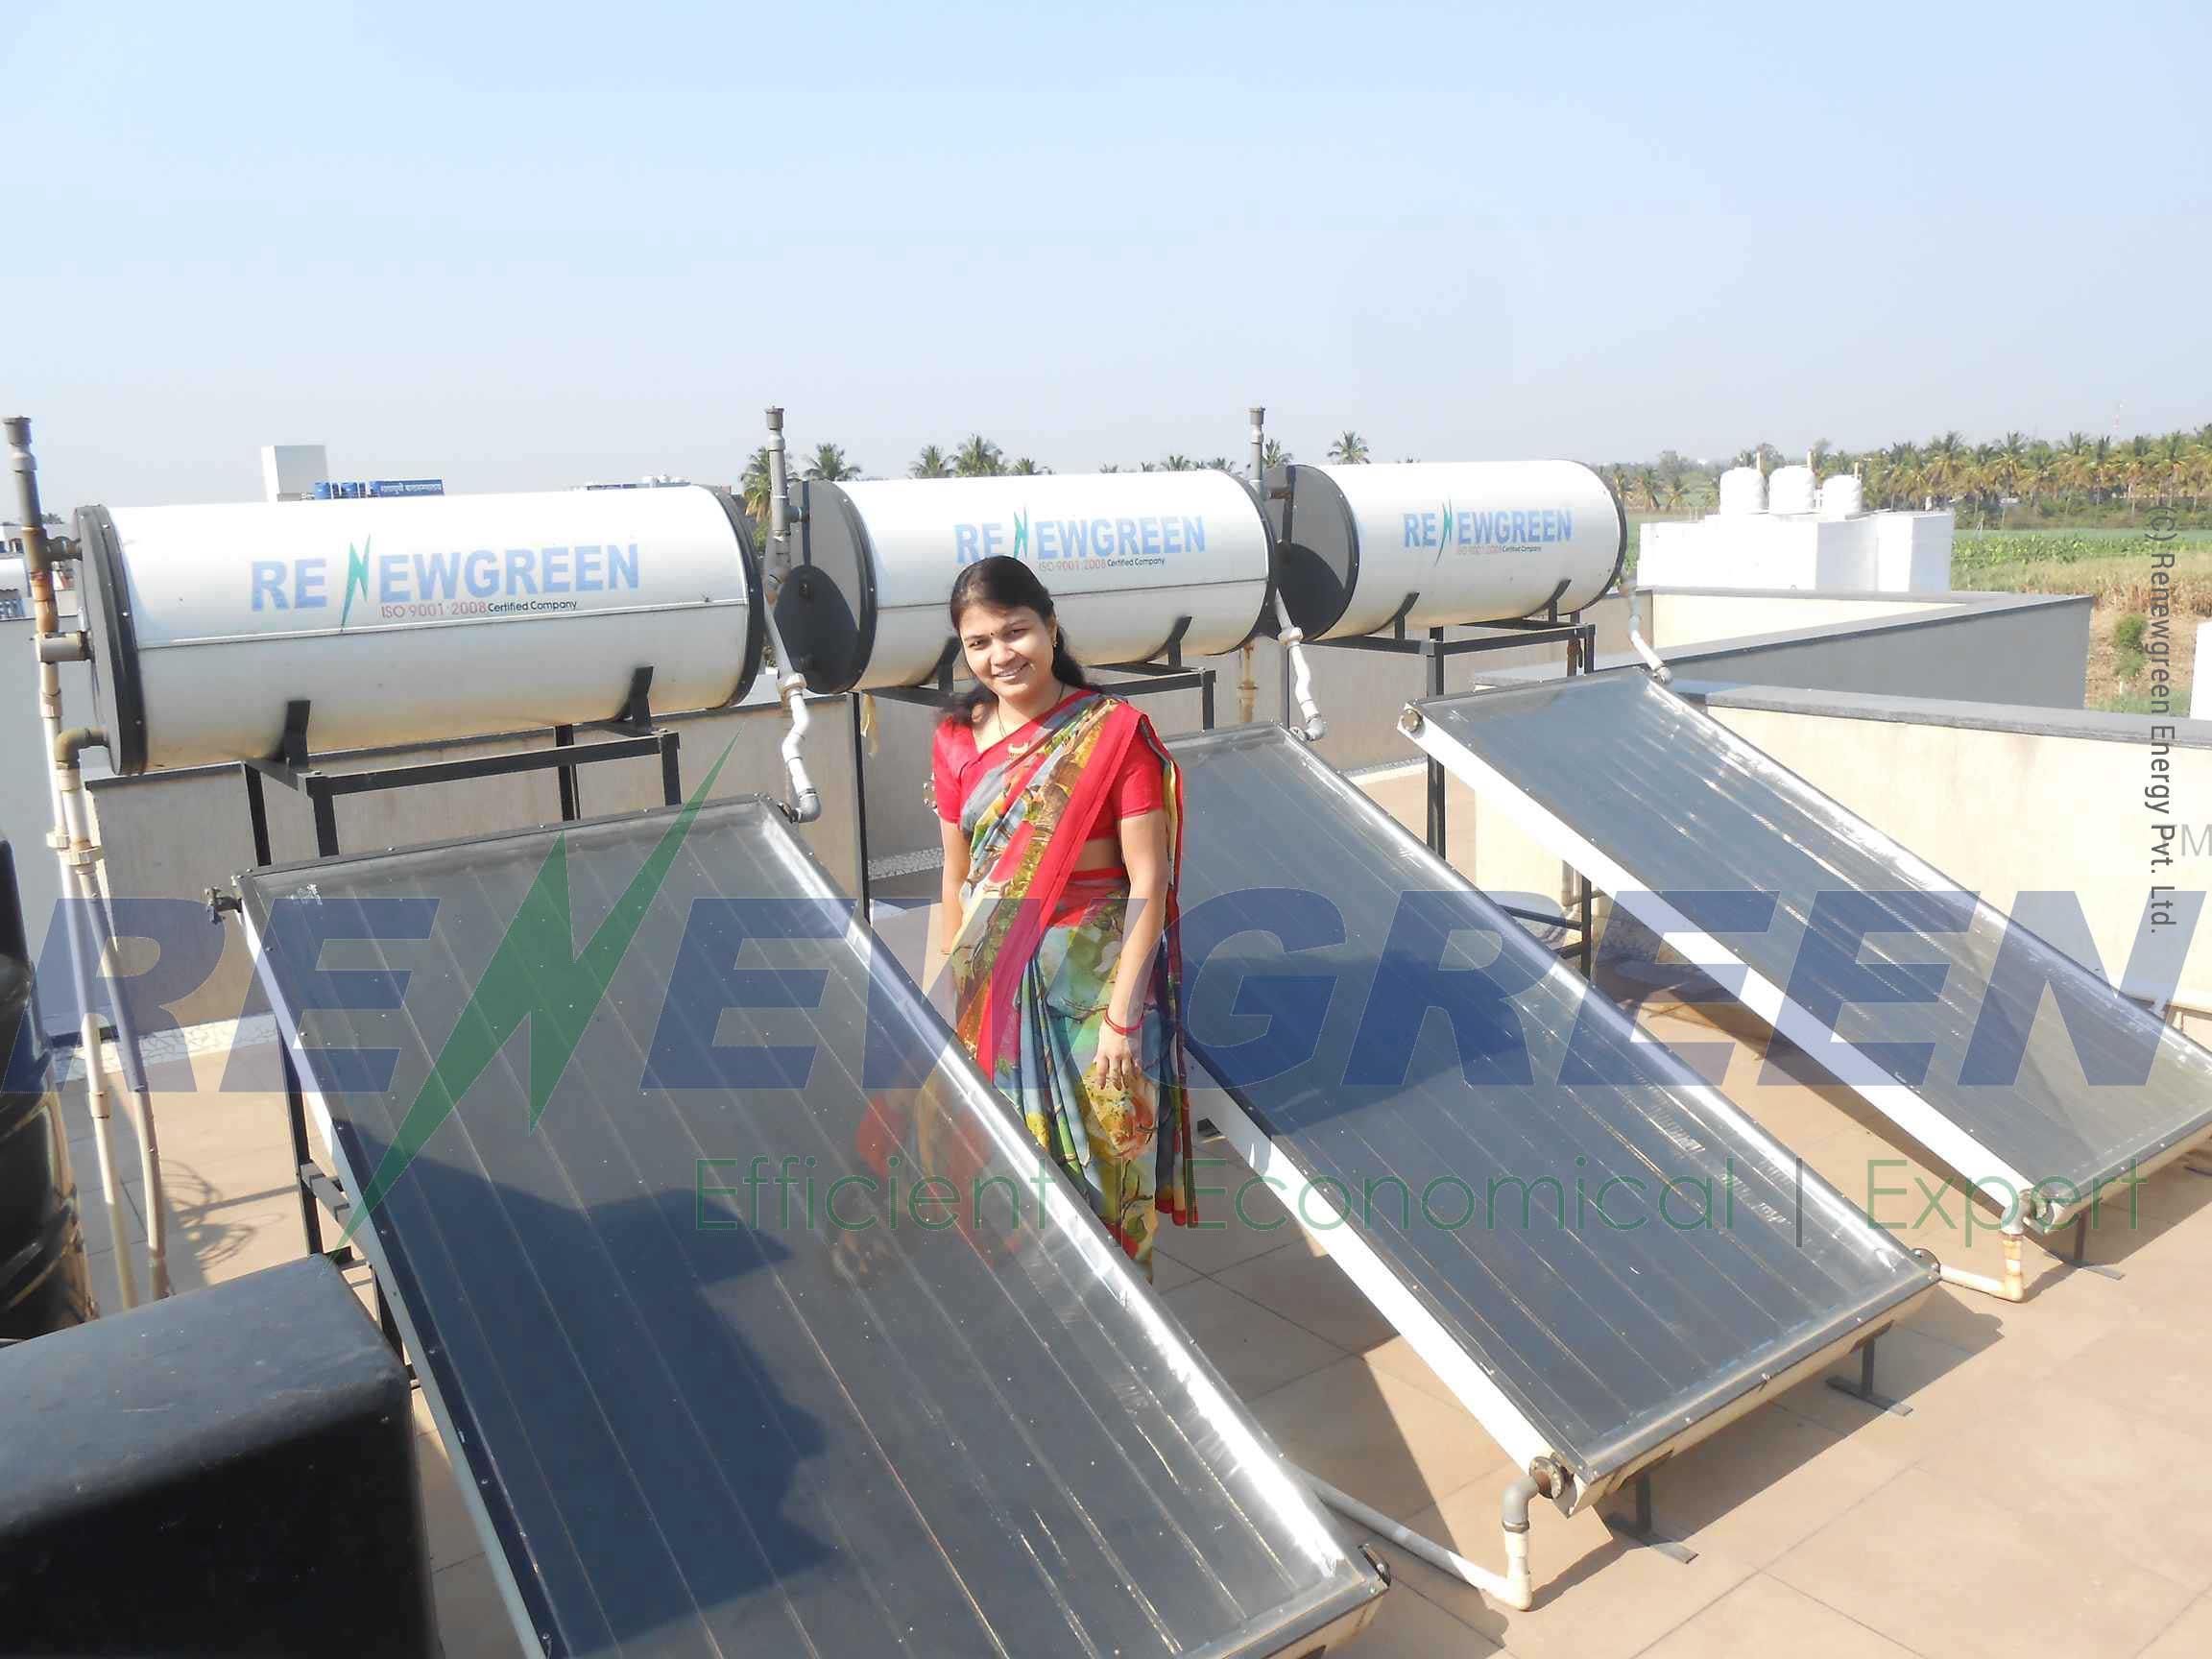 Solar Water Heater | Renewgreen Energy